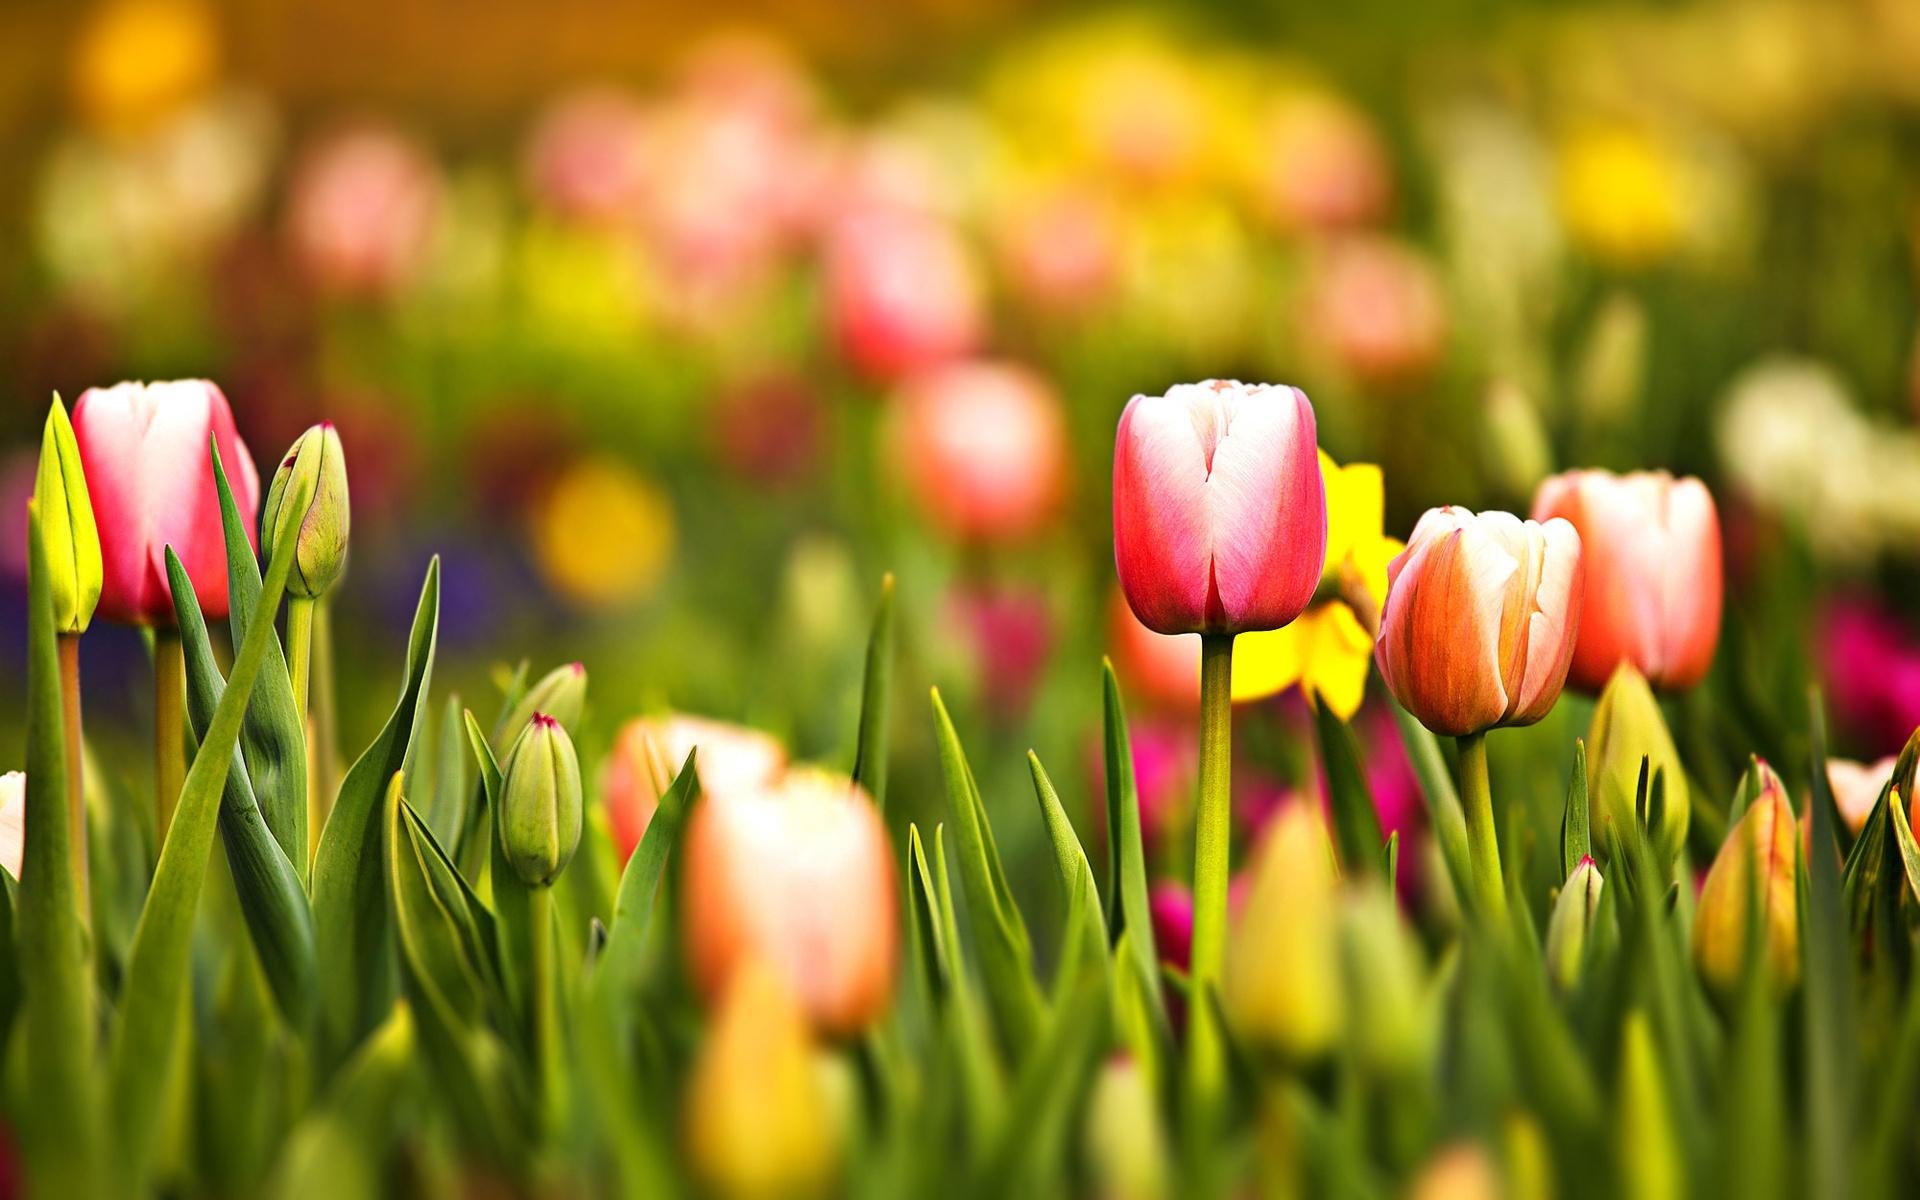 клумба, тюльпаны, бутоны